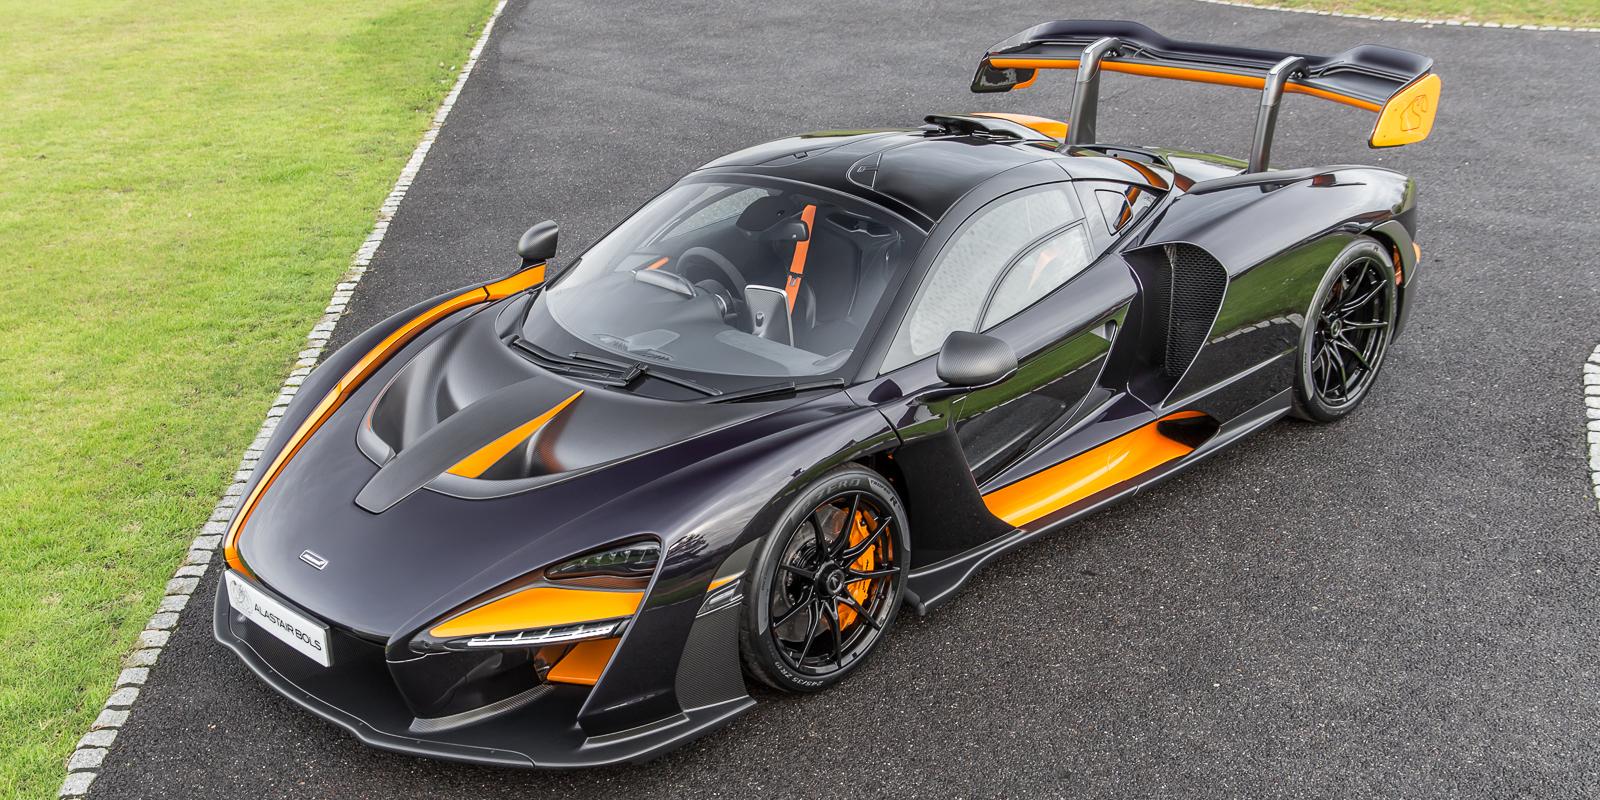 McLaren Senna – Amethyst Black